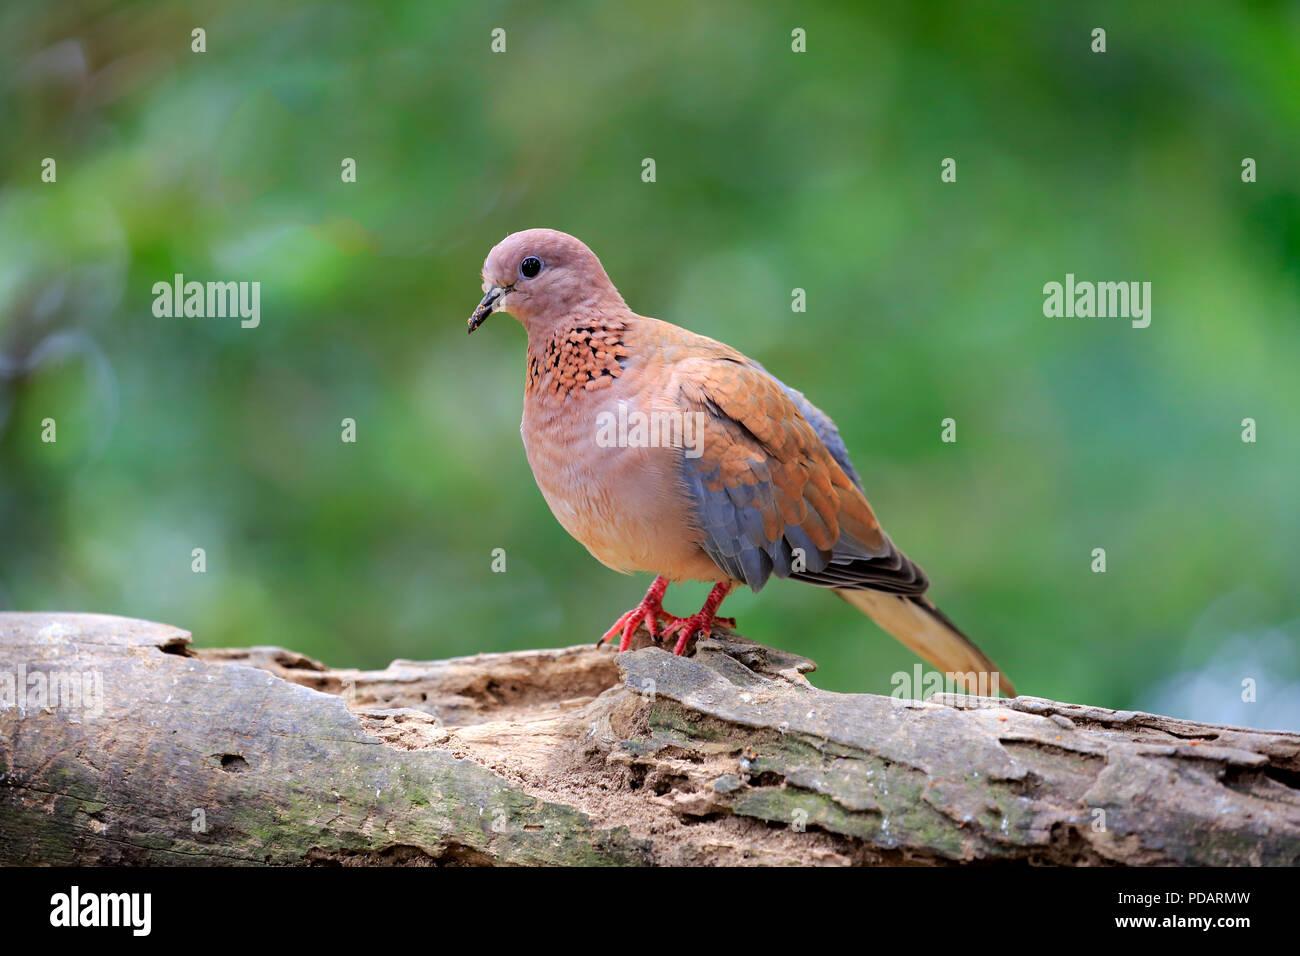 Laughing Dove, adult on tree, captive, Singapore, Asia, Streptopelia senegalensis Stock Photo